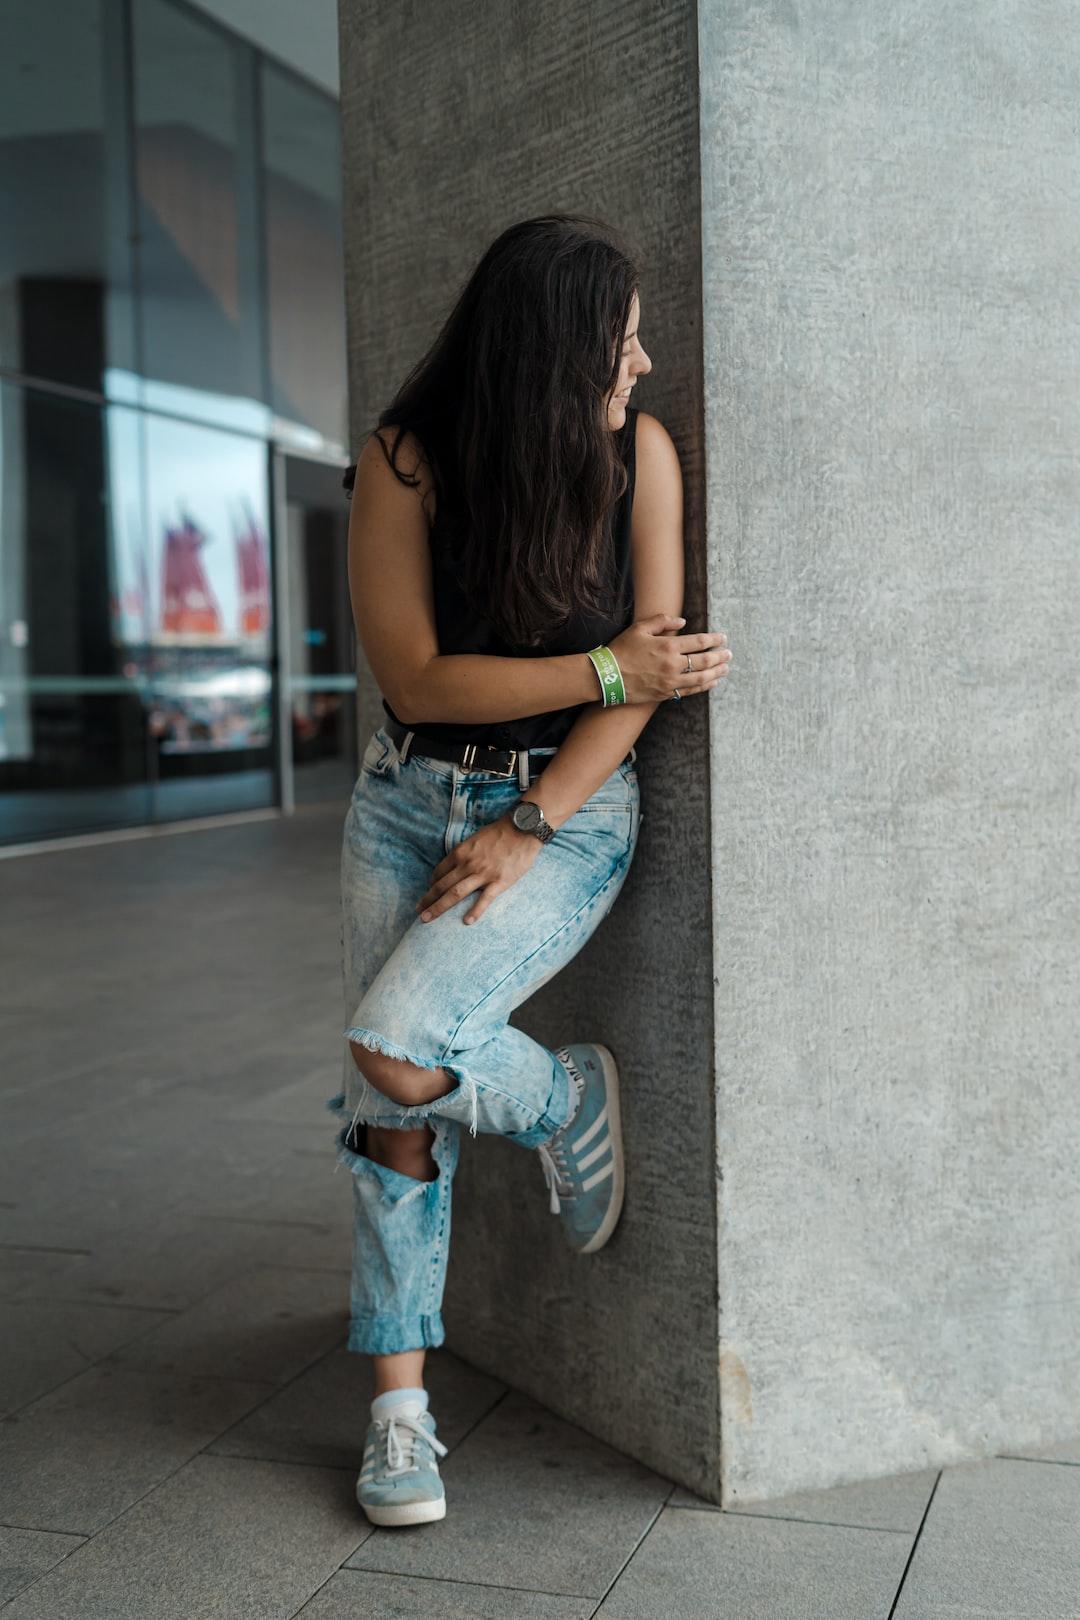 Girl peeking beside the wall